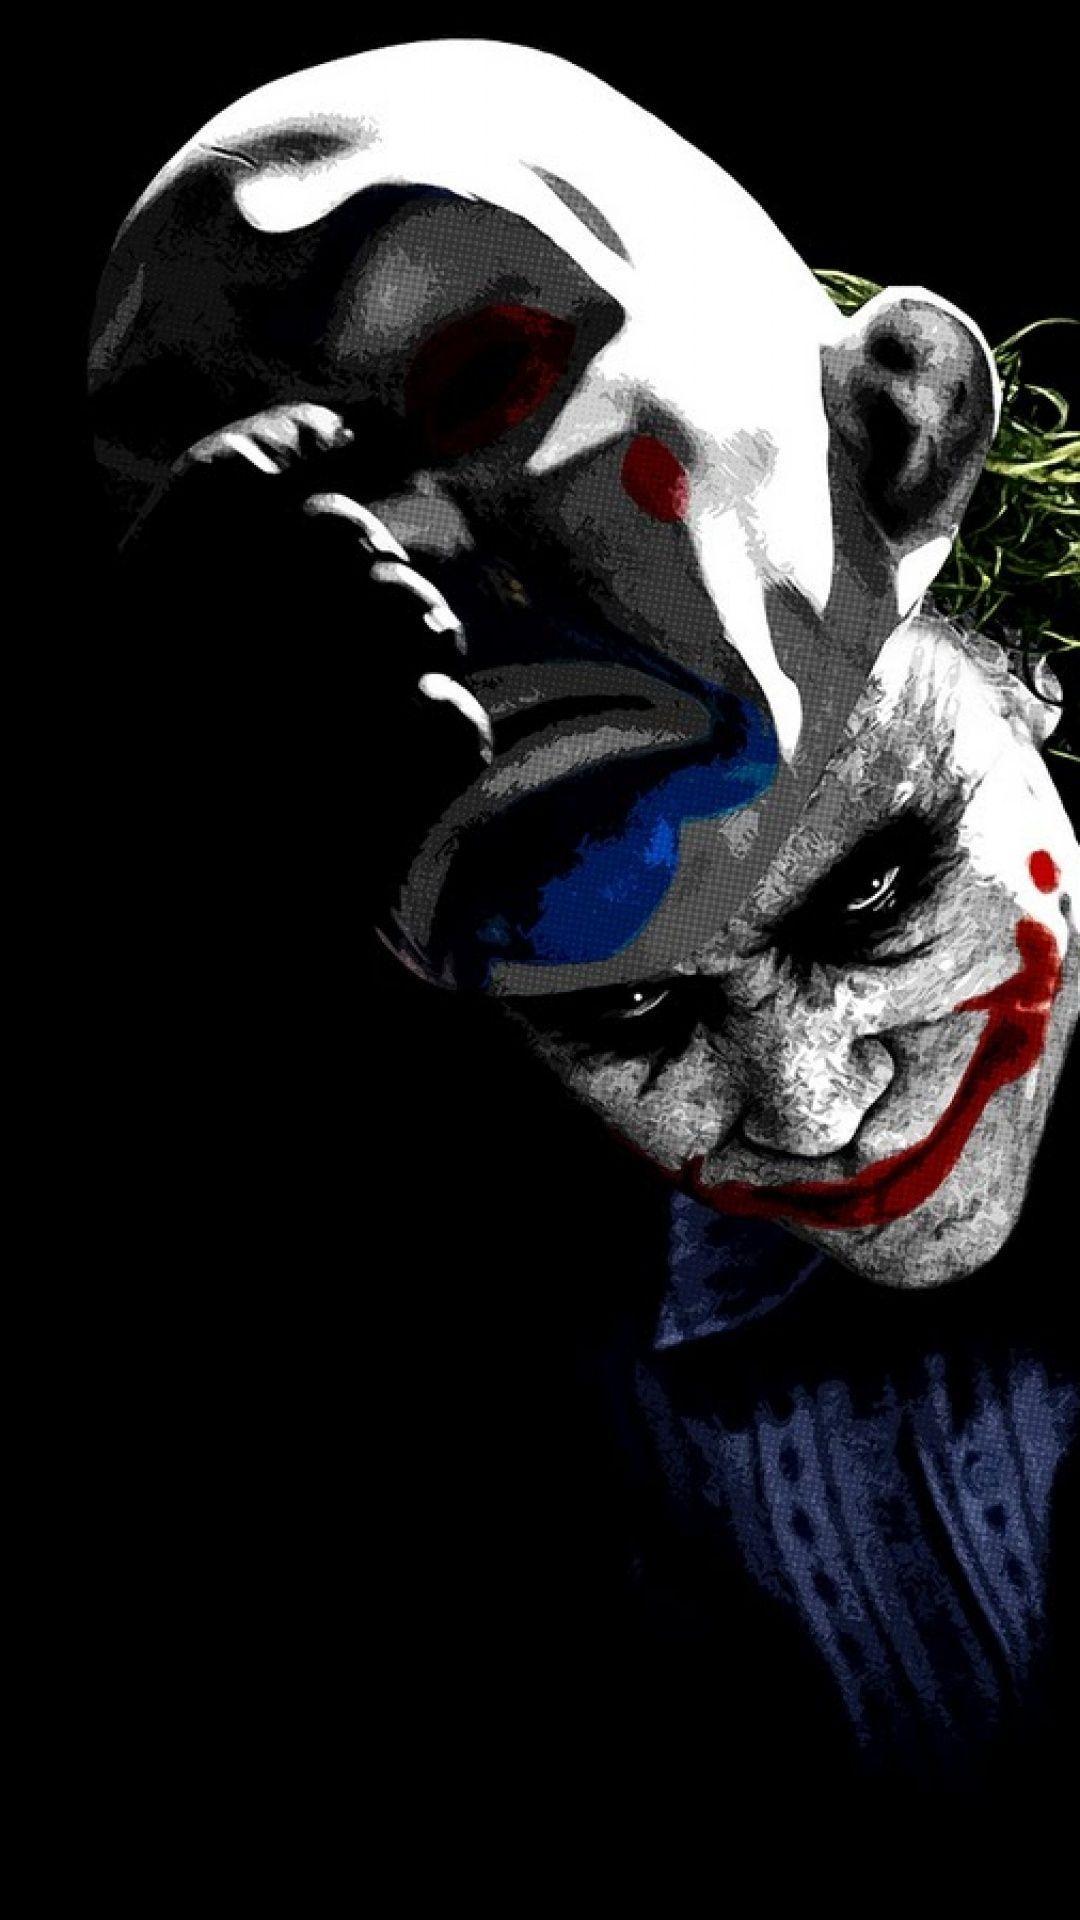 The Joker Iphone Wallpapers Top Free The Joker Iphone Backgrounds Wallpaperaccess